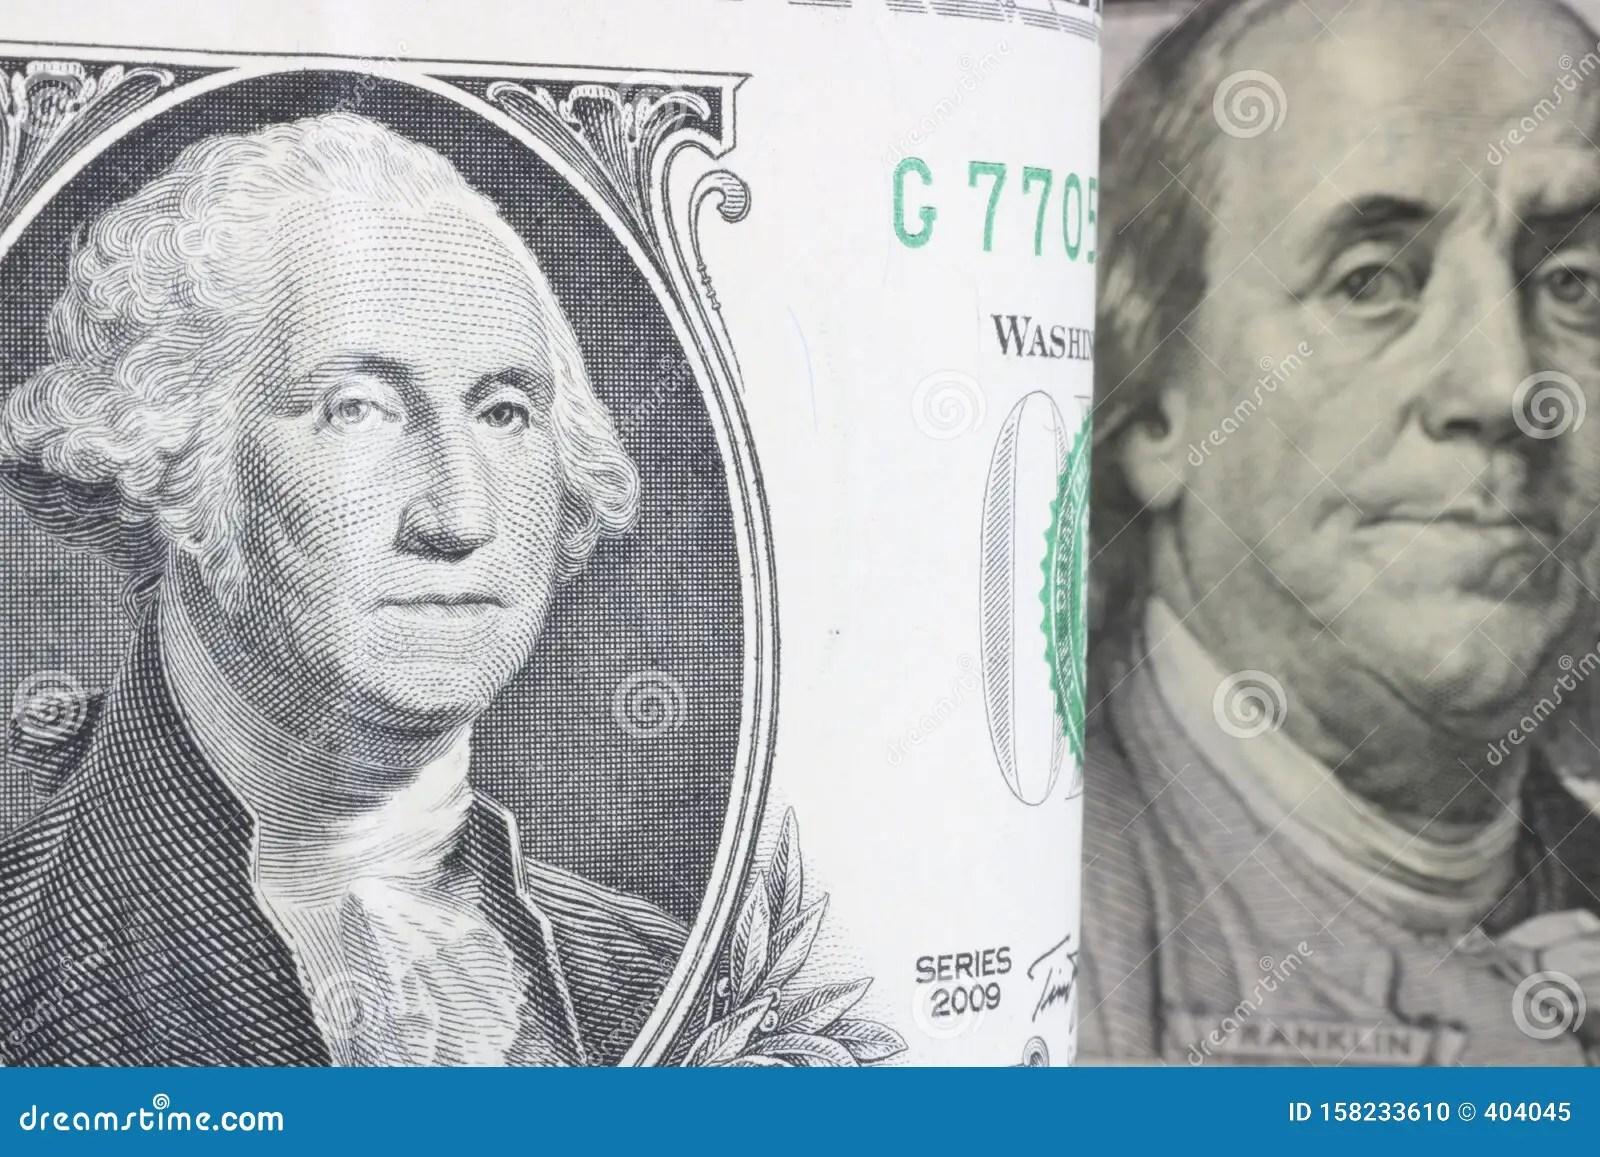 Us President Washington On A Bent 1 Dollar Bill Close Up